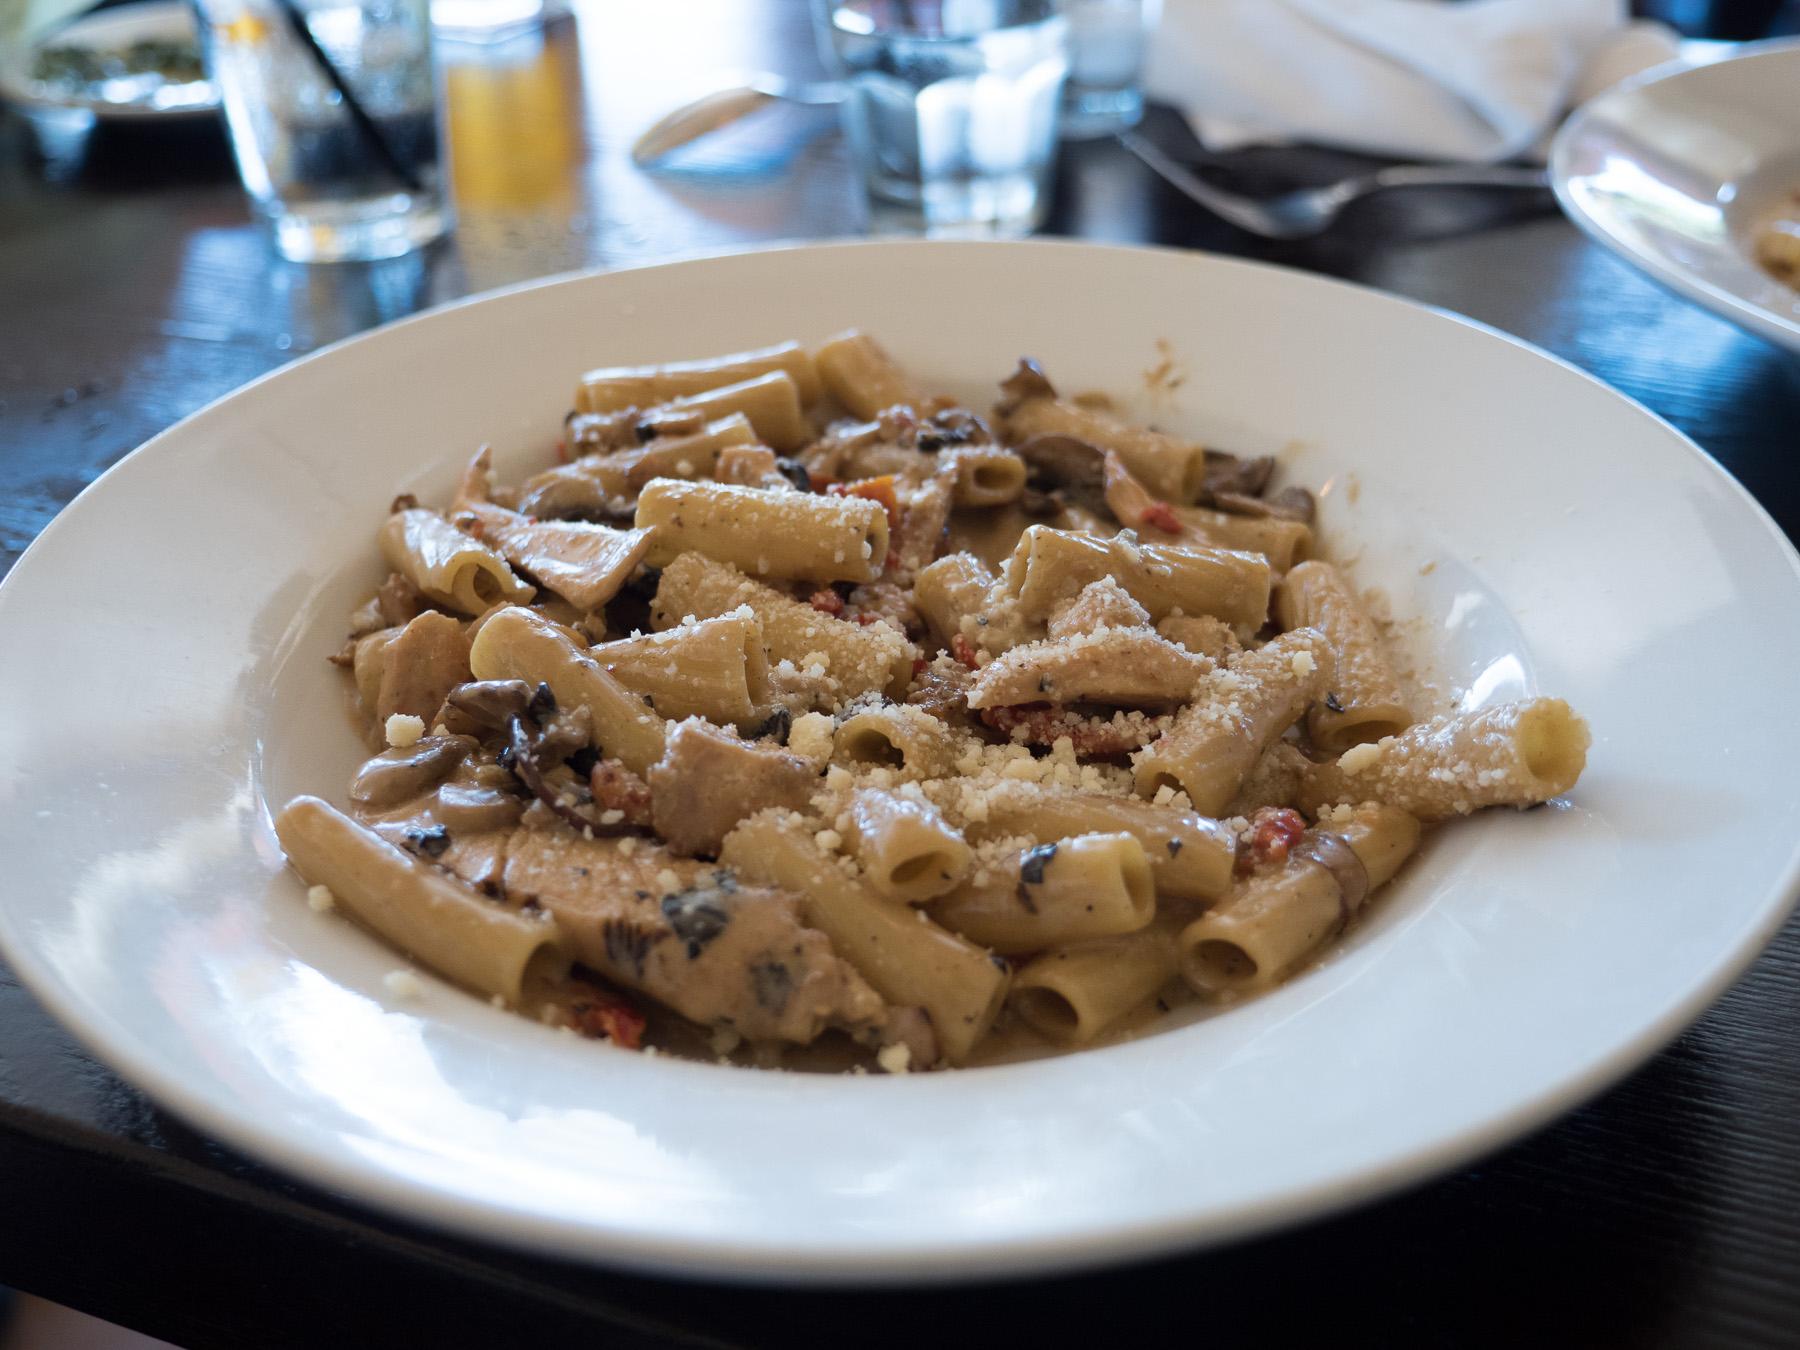 Pasta #2 Rigaton Toscana.ISO 400, f/2.8, 1/100th